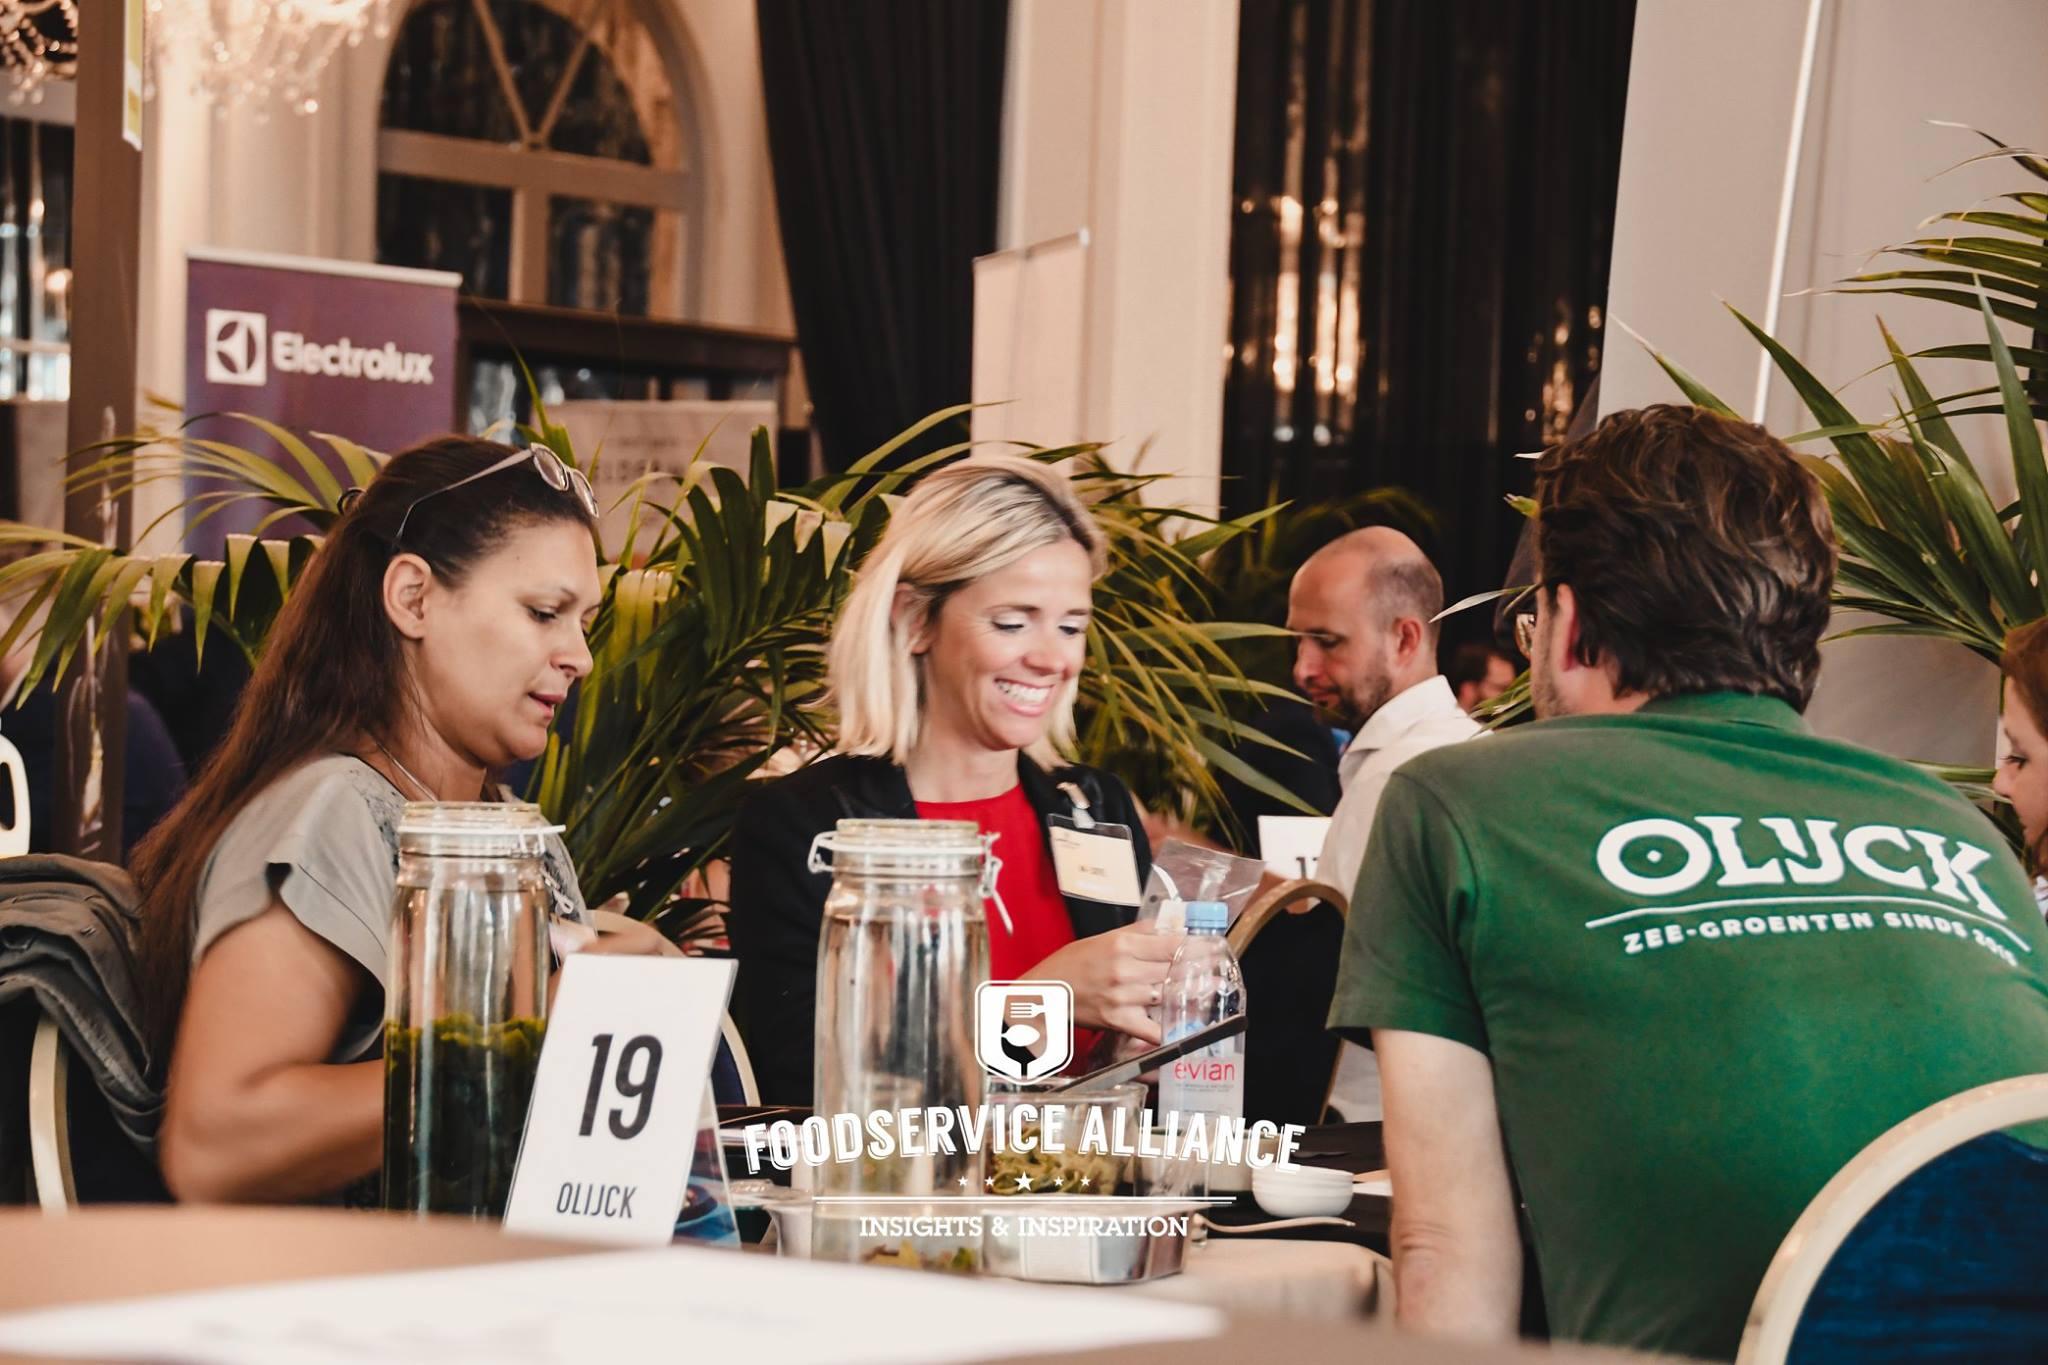 TERUGBLIK: FOODSERVICE SPEEDDATE EVENT 2018